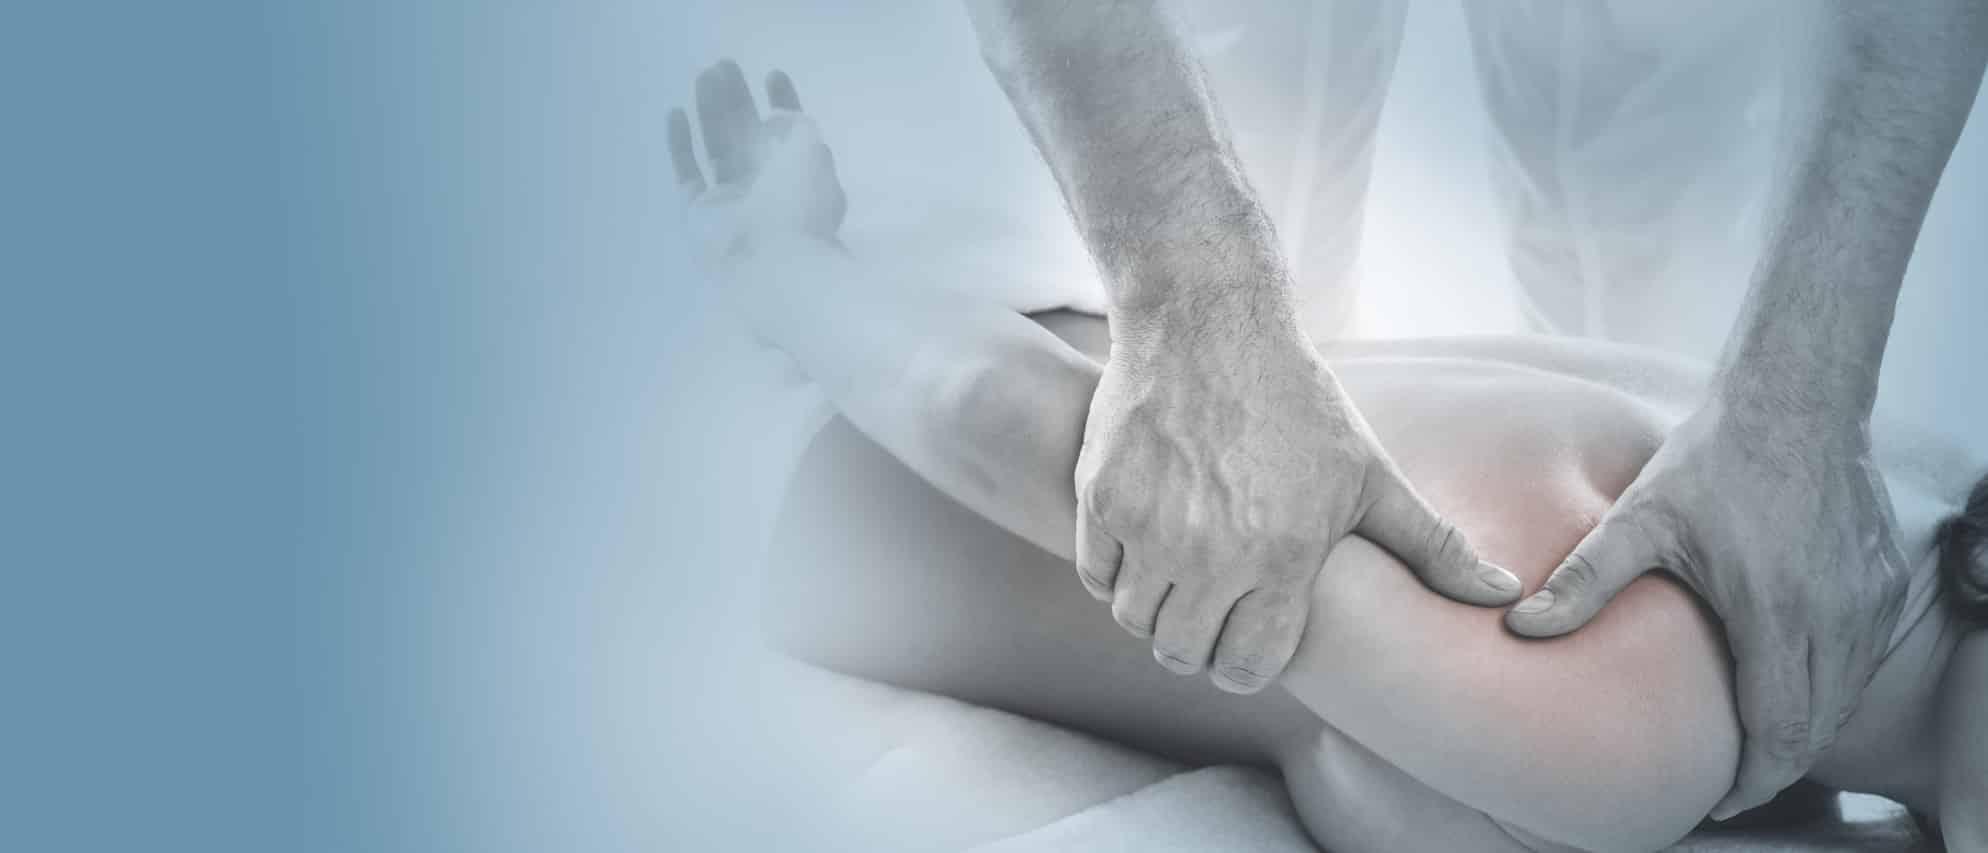 Osteopata a Genova - Francesco Bertino